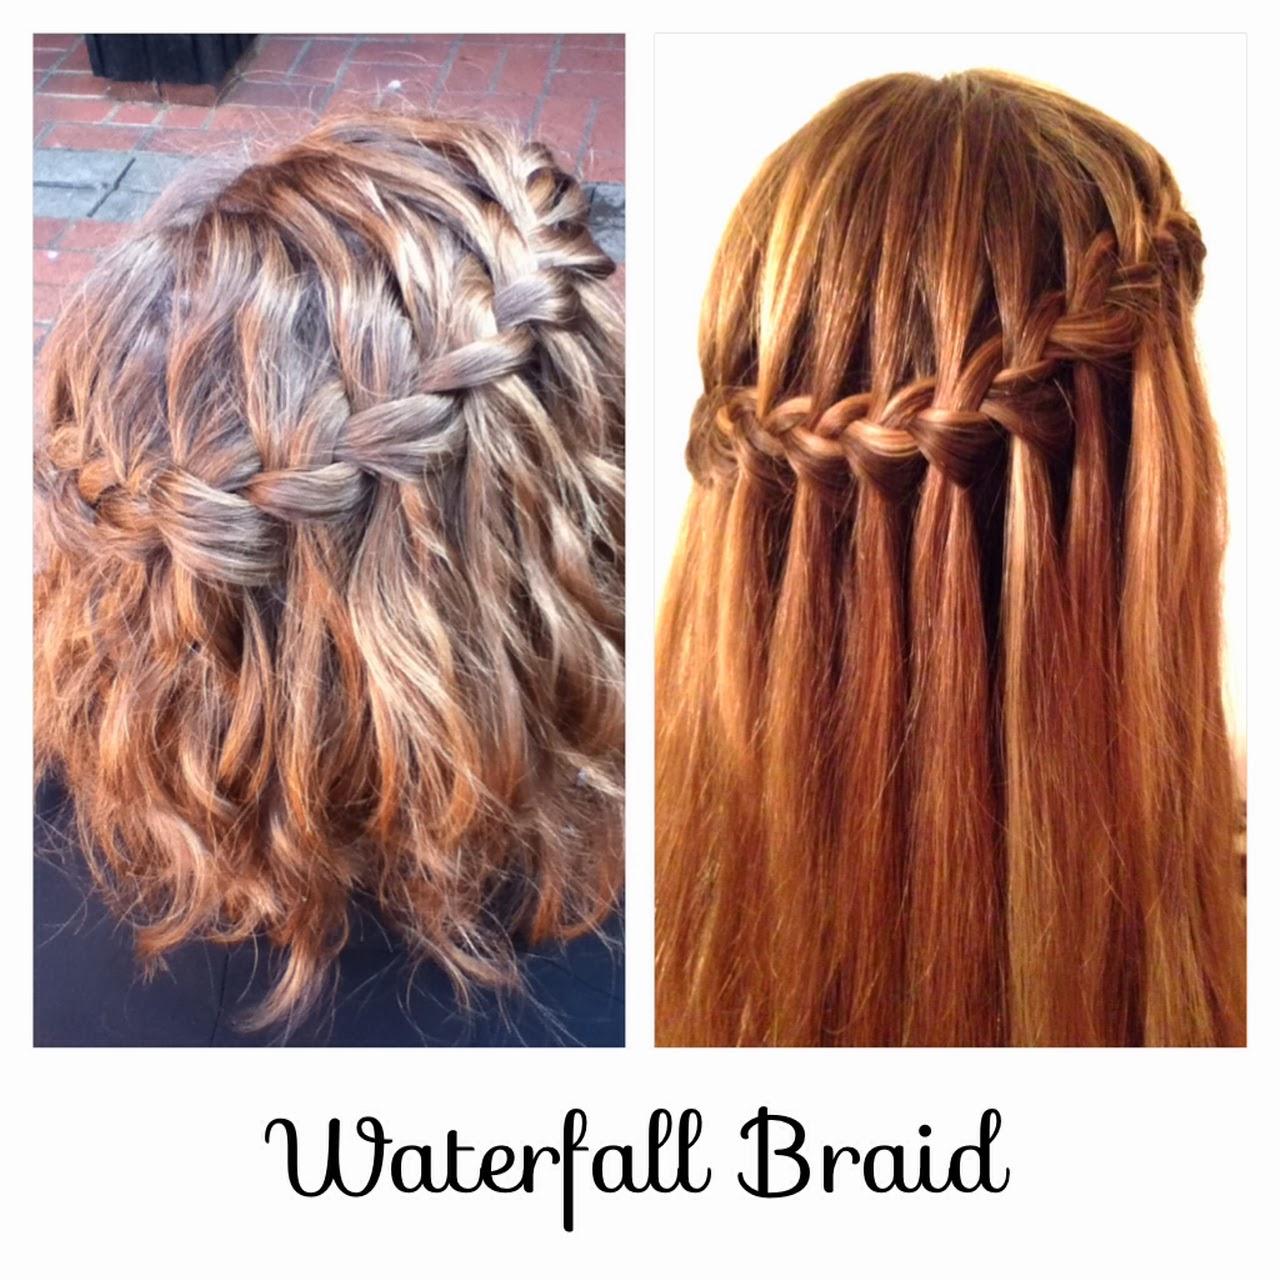 Waterfall Braid Hairstyles: Hair Styles By Liberty: Waterfall Braid